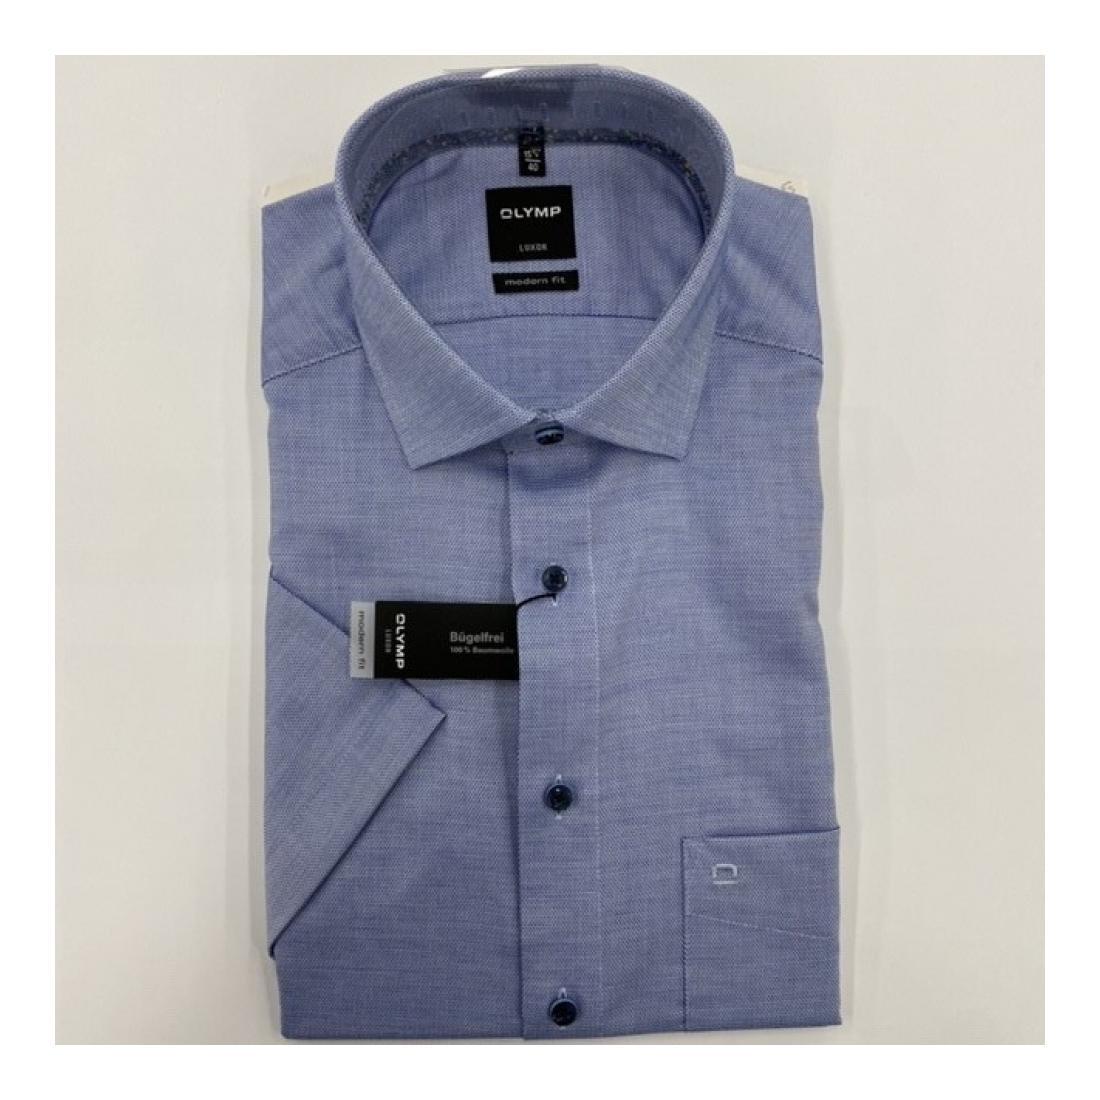 Olymp Business Hemden Herren 1205/52 Hemden